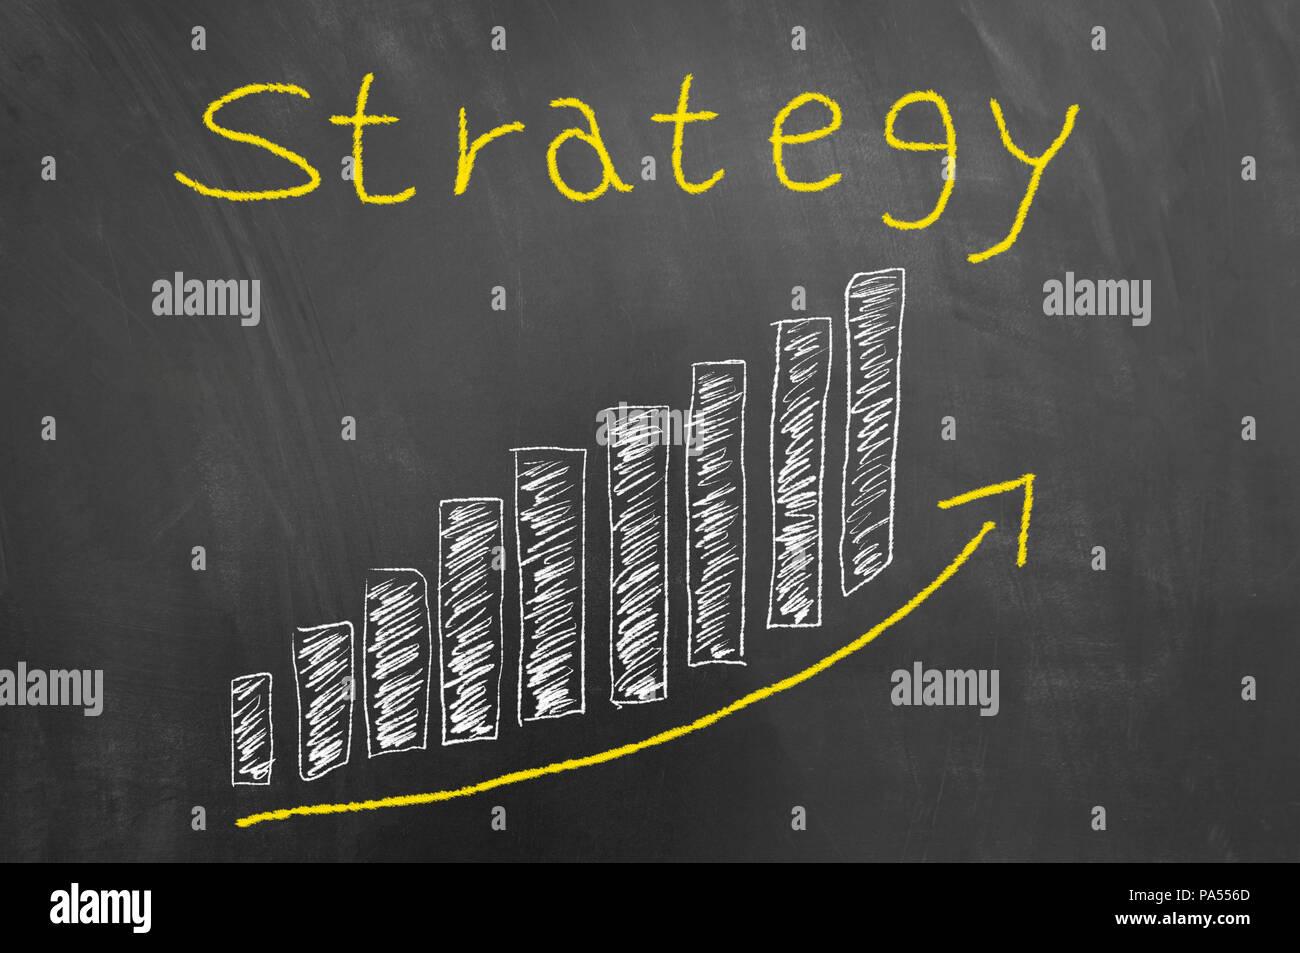 strategy arrow up bars chalk graphic on chalkboard or blackboard as